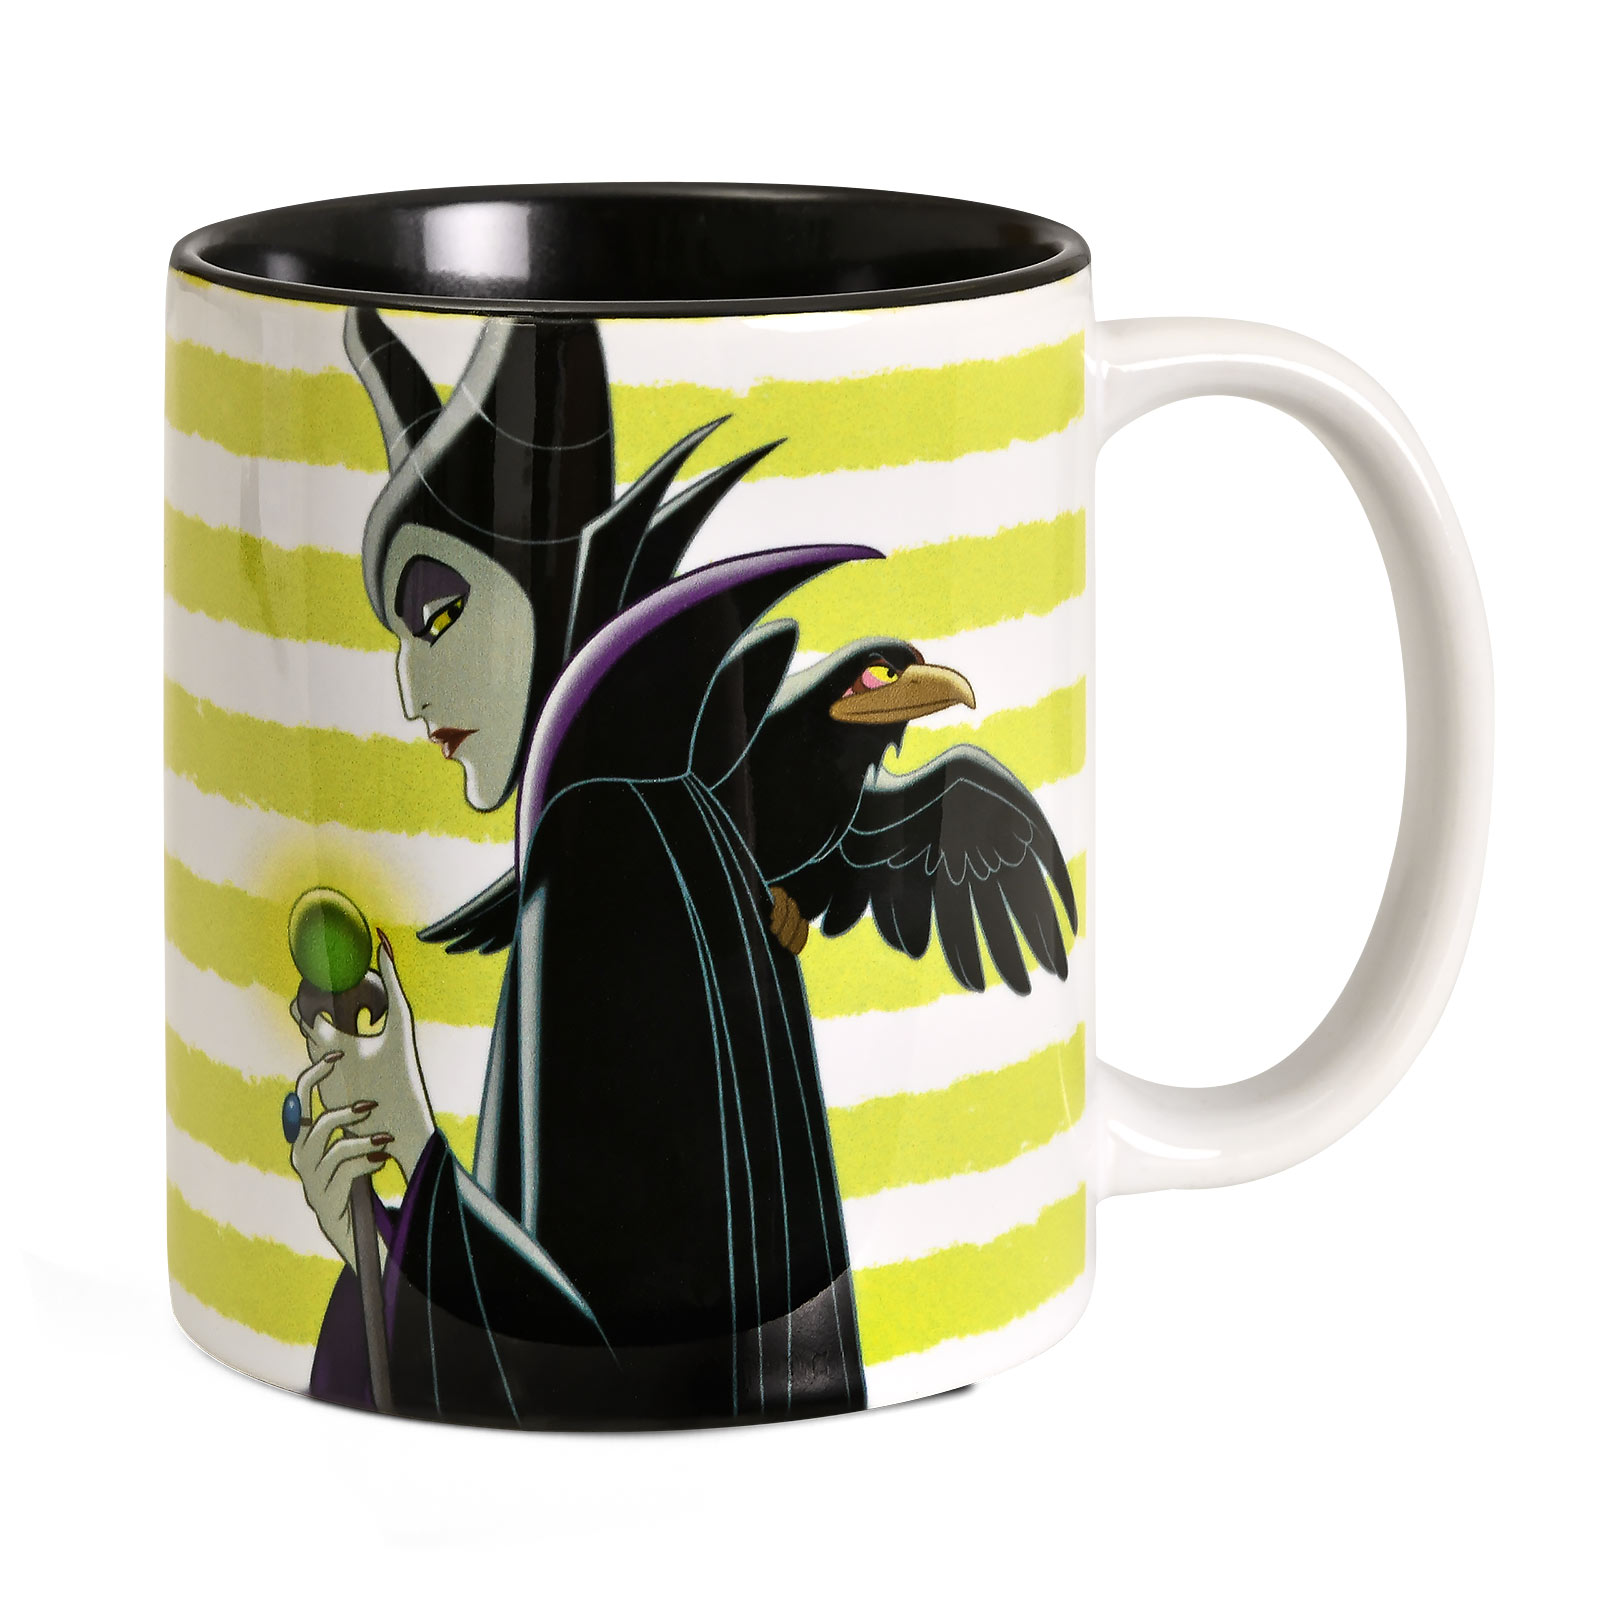 Maleficent - Villains Character Tasse